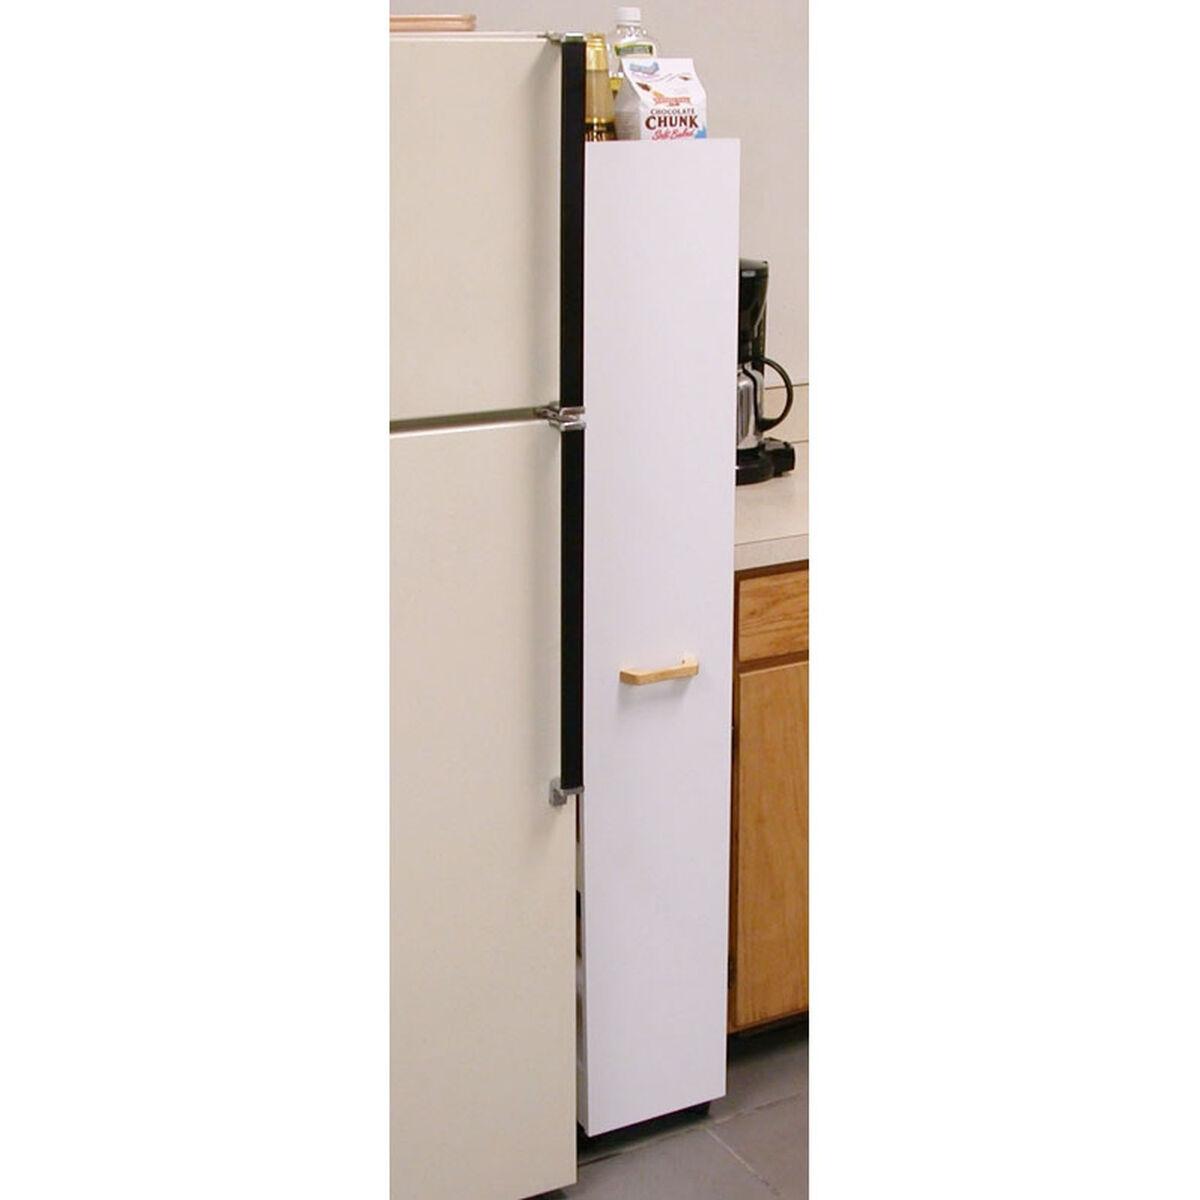 Venture horizon thin man pantry cabinet 4036 for White thin man pantry cabinet